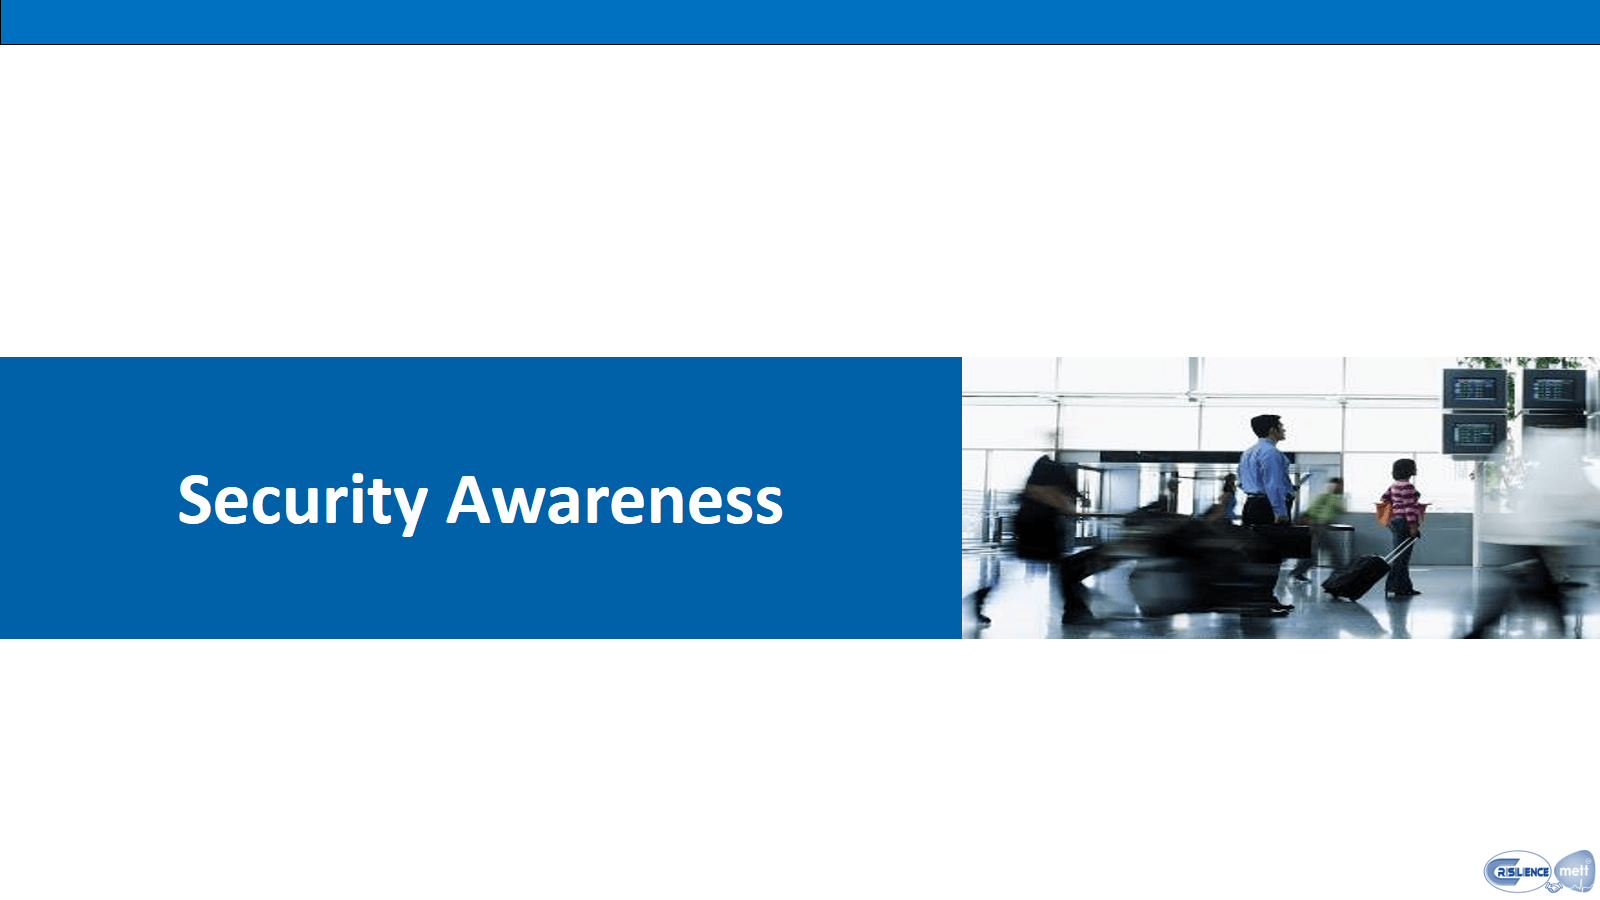 CIMAT 2nd Slide Security Awareness 1